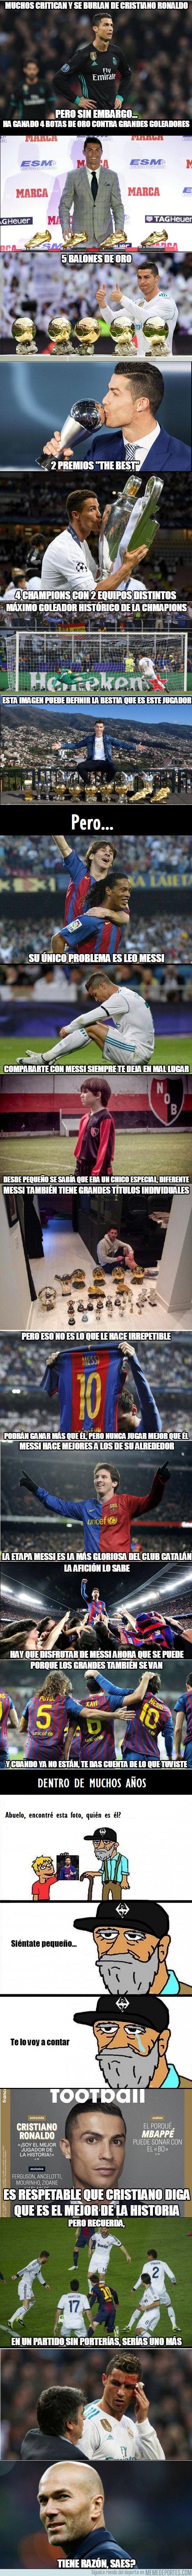 1019480 - Cristiano y Messi, historia del fútbol